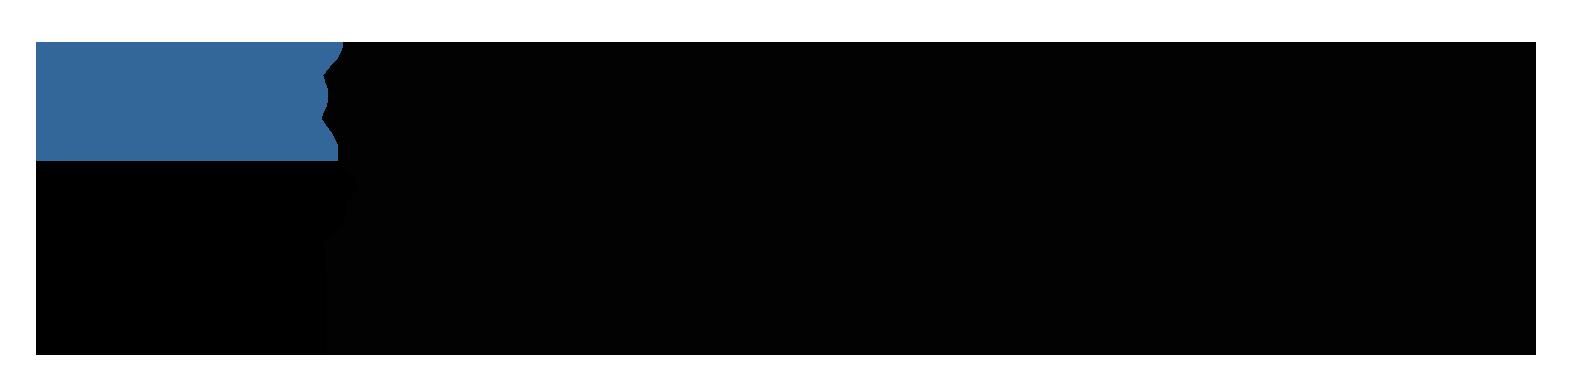 Sonatype, Inc.  logo